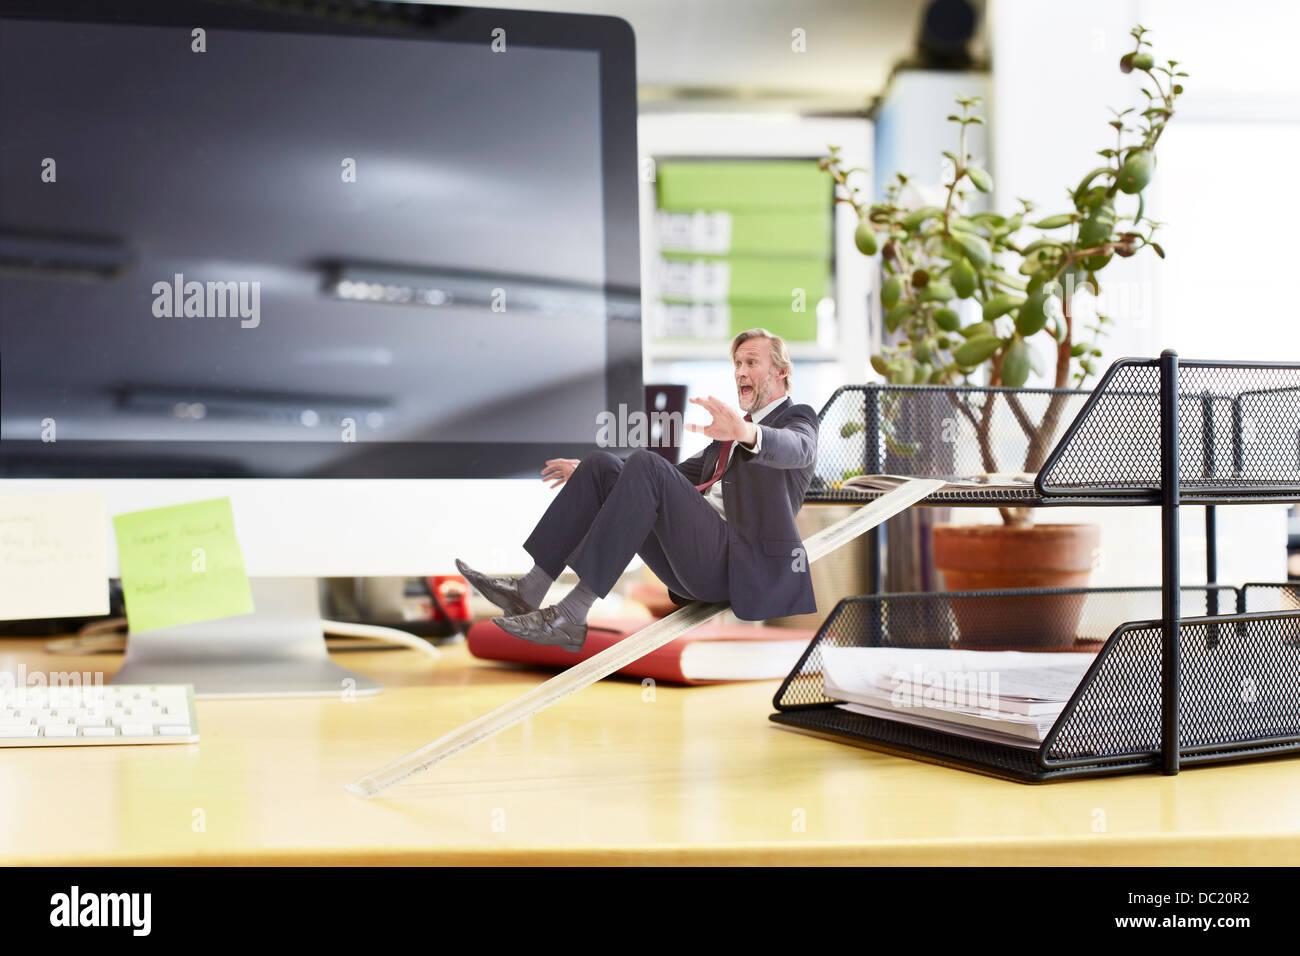 Mature businessman sliding down ruler on oversized desk - Stock Image